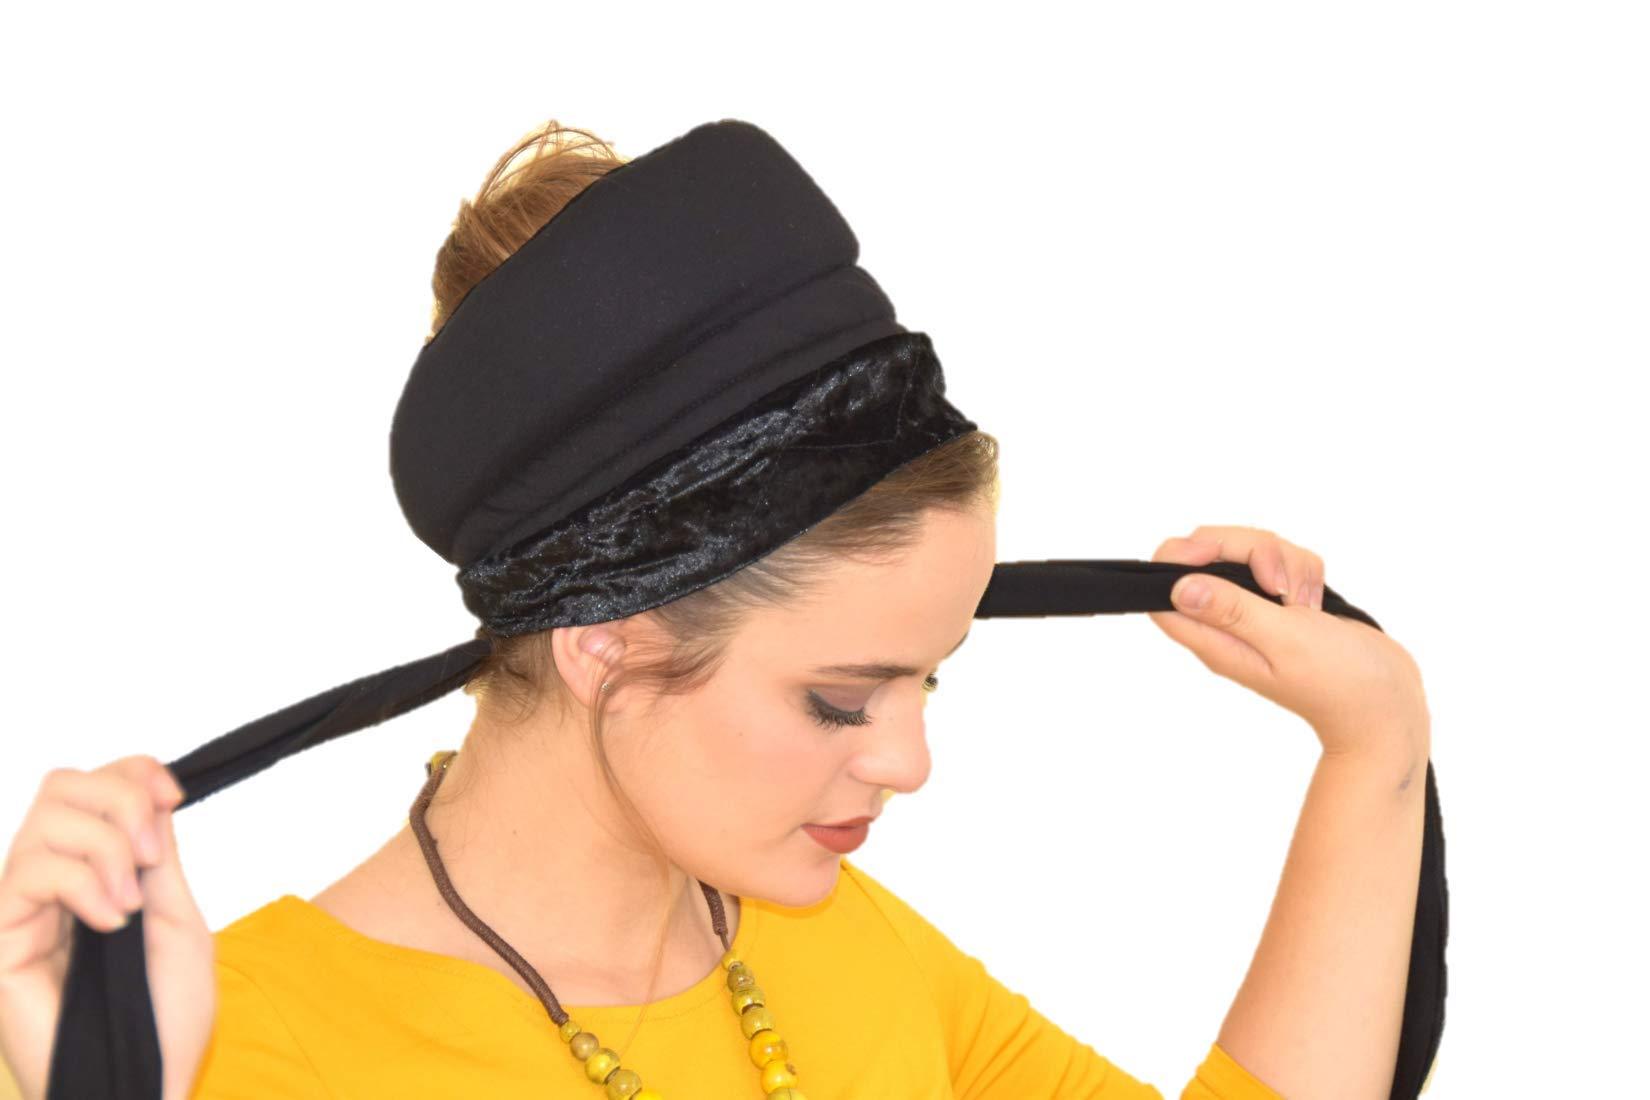 Sara Attali Design BoboBand, Big Volume & Non-Slip Headband Great under Headband Tichel Black by Sara Attali Design